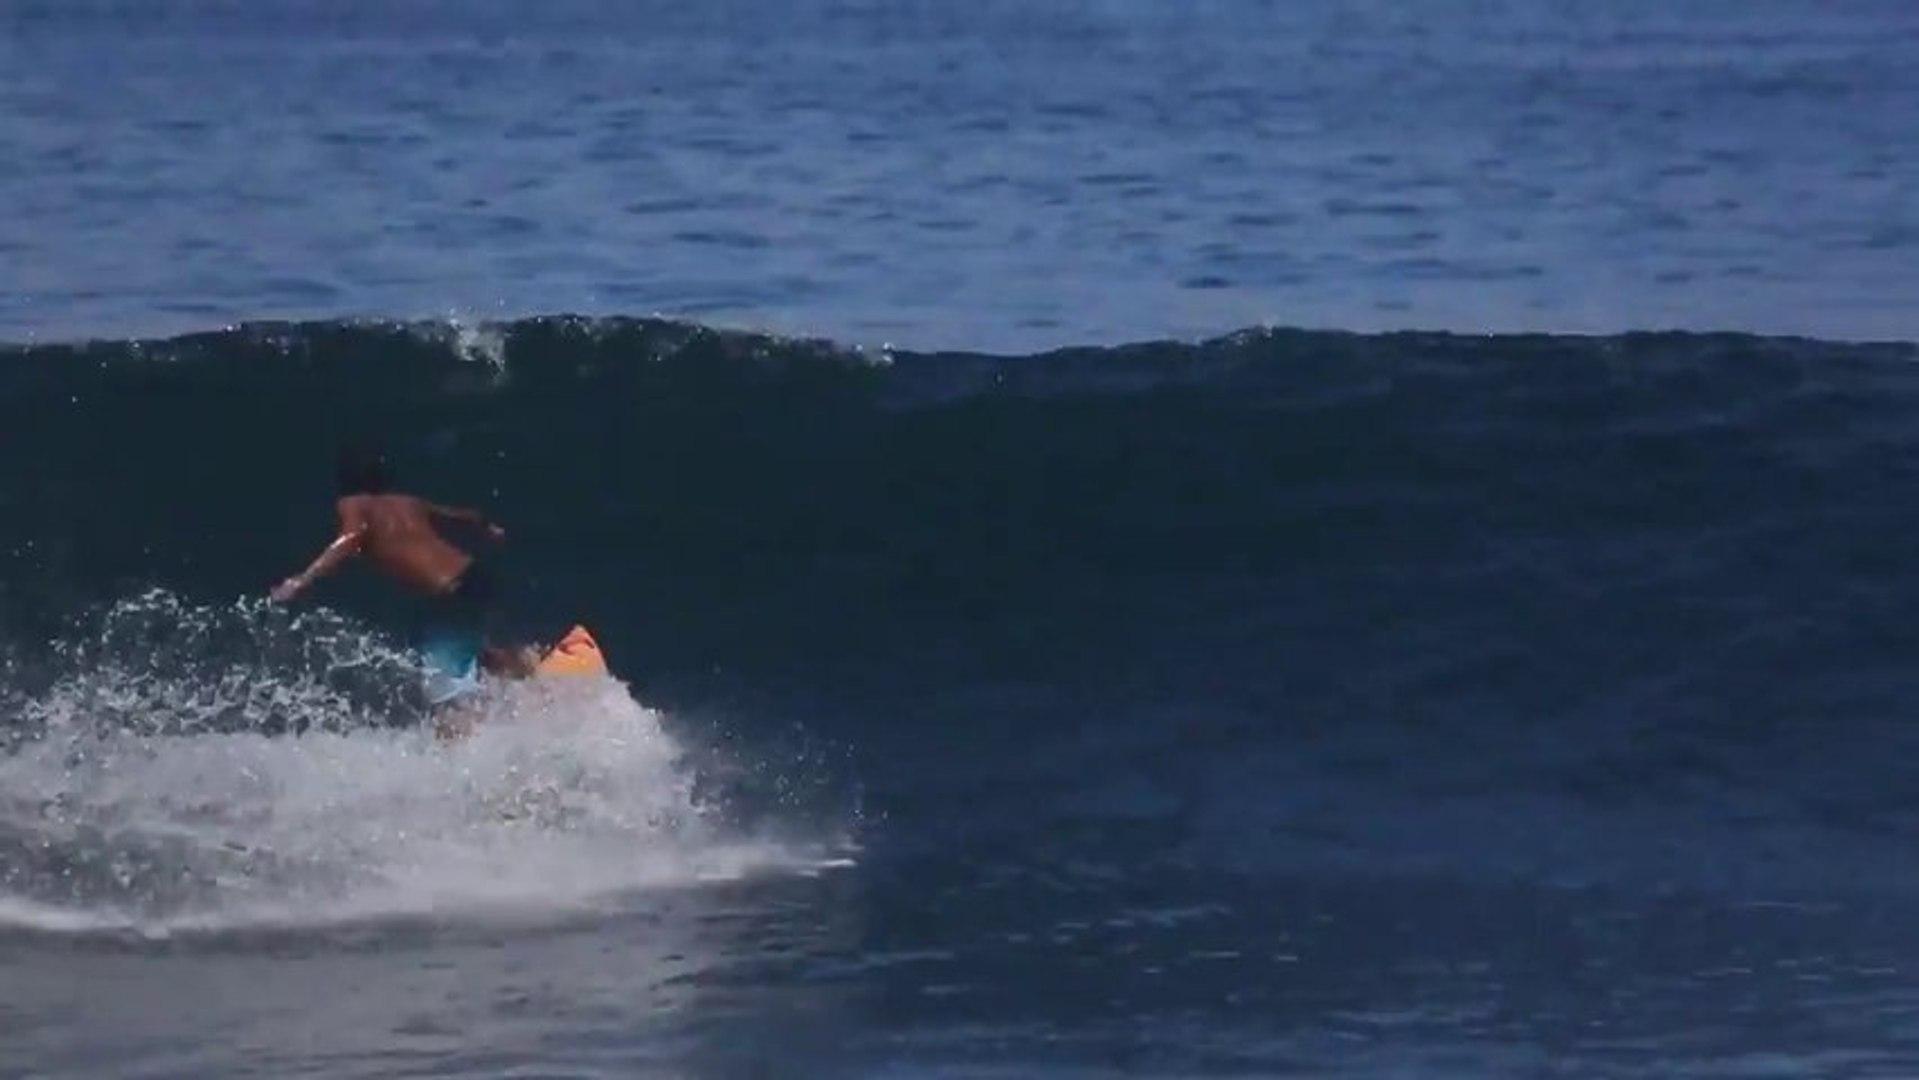 Surfing is Everything - Garut Widiarta - 2013